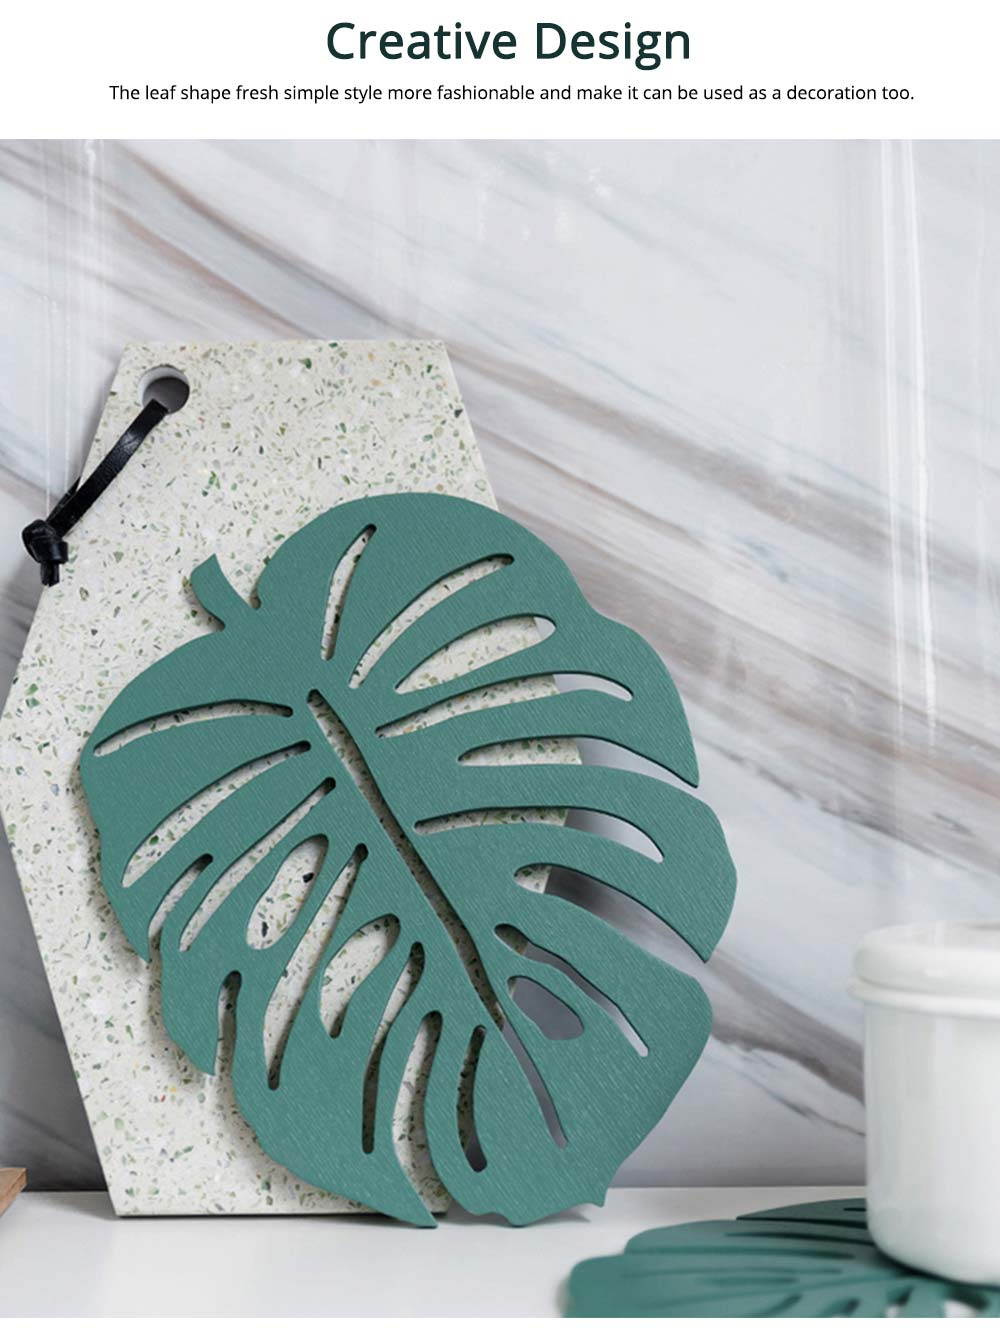 Bamboo Heat Insulation Pads, Removable Heat Resistant Plate Mat Pot Holder 4